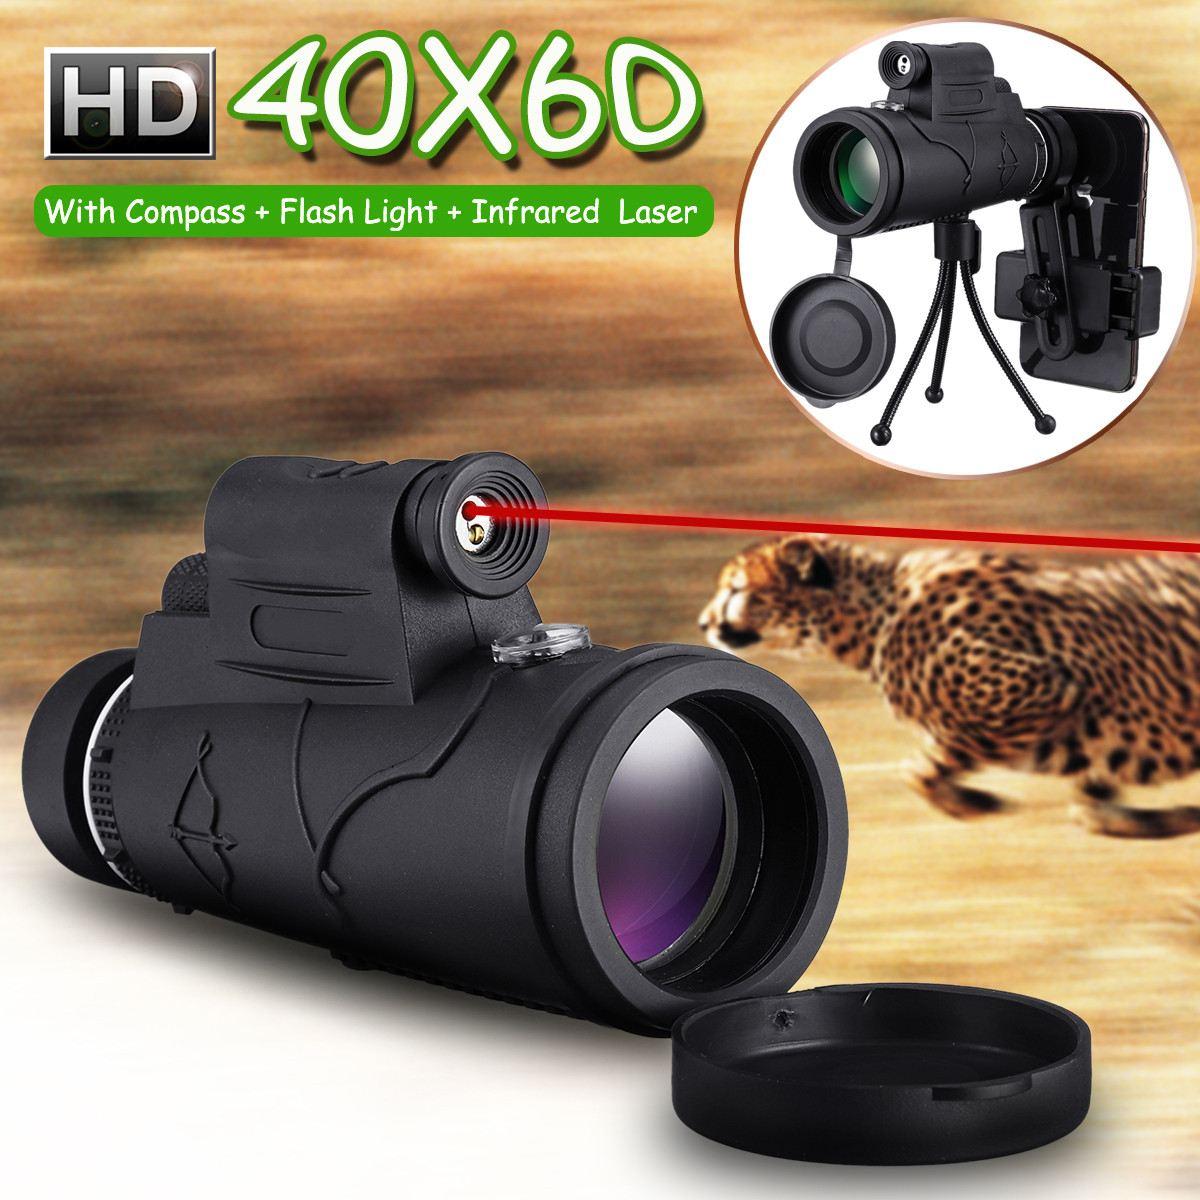 40X60 Zoom Laser/LED Monocular Telescope Telephoto Day & Night Vision Phone Camera